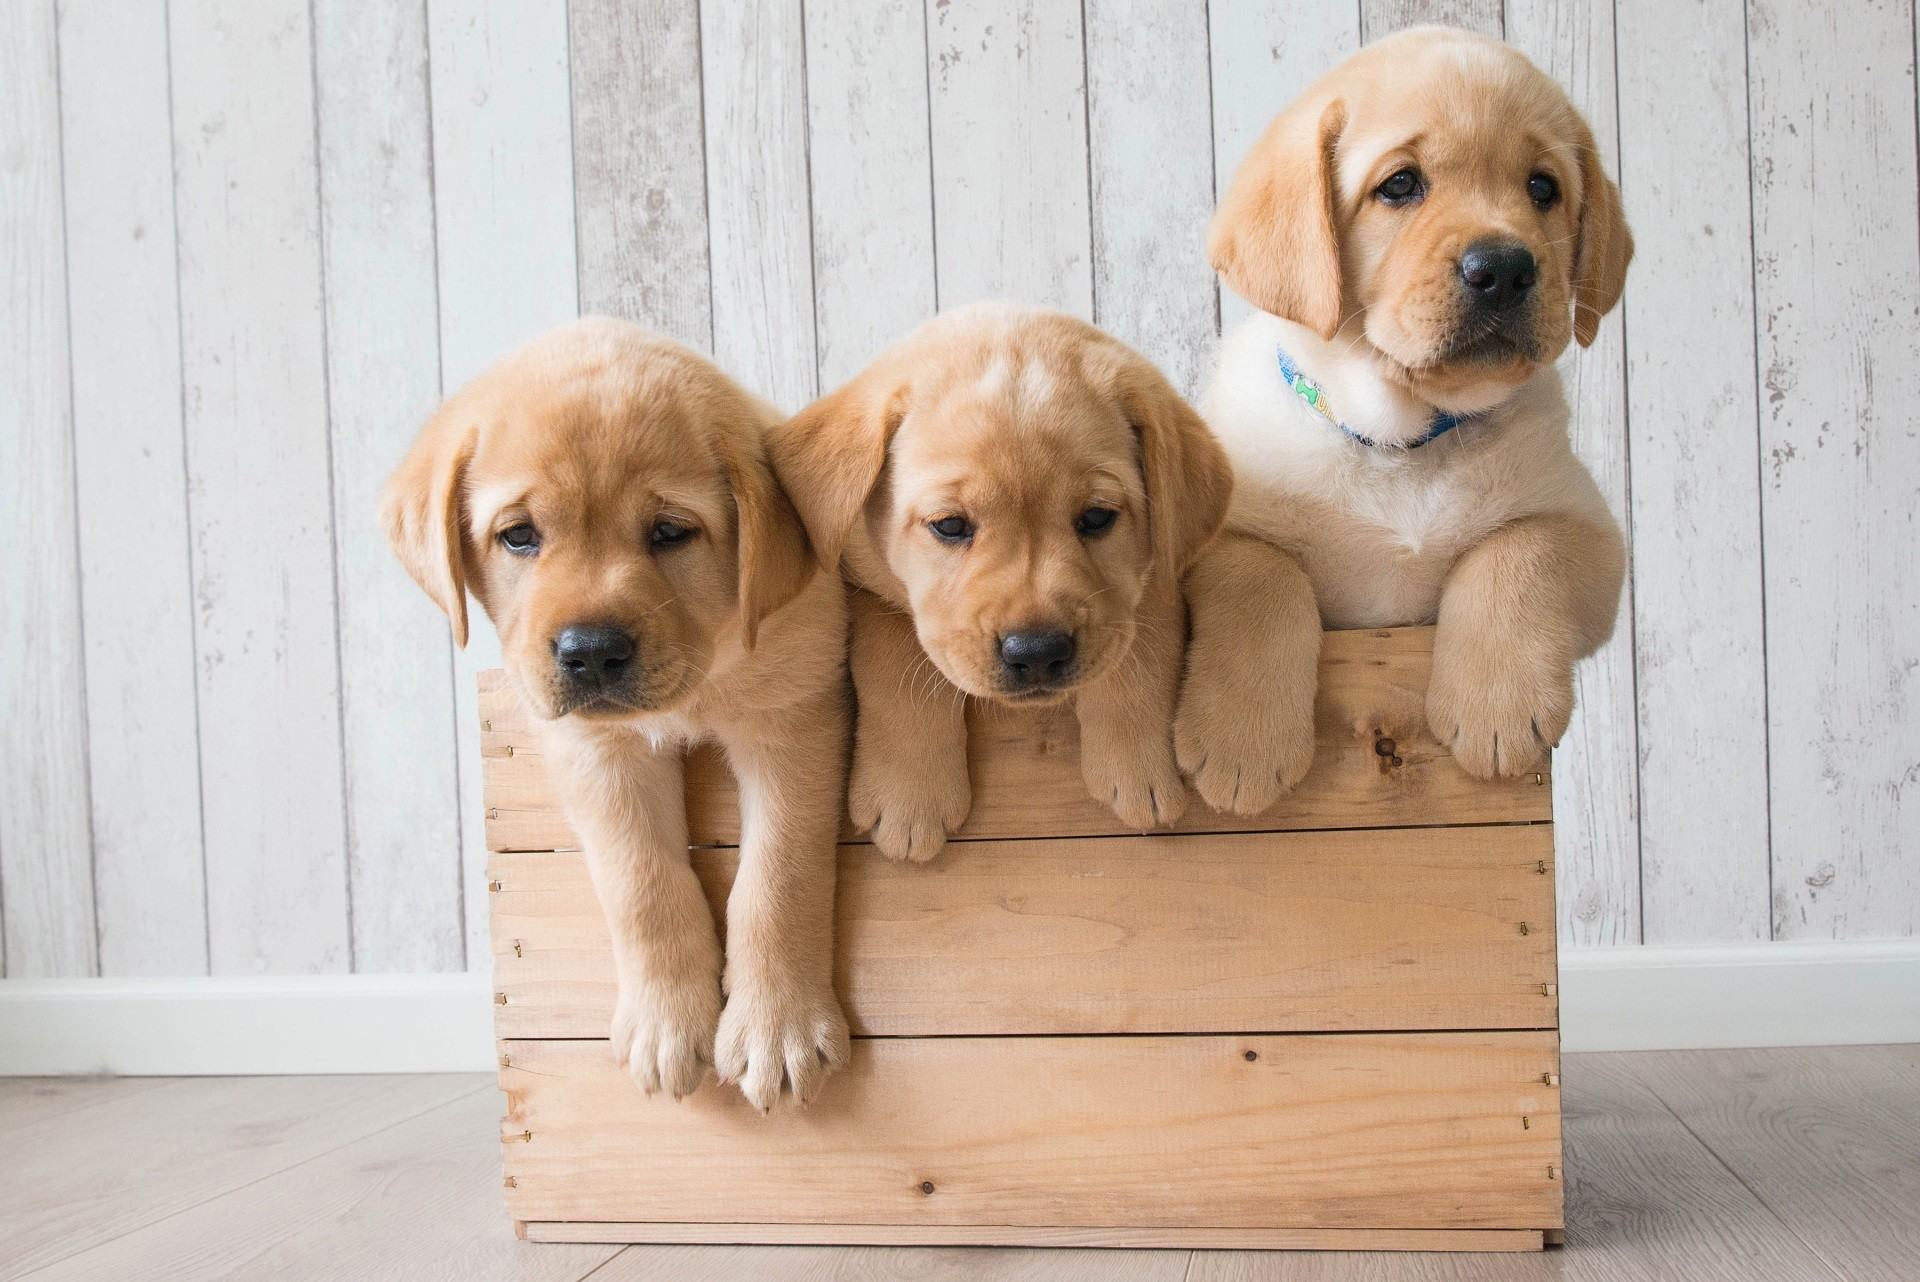 Cute Puppies Wallpaper 1080p Cute Puppies Wallpaper Hd 55 Images